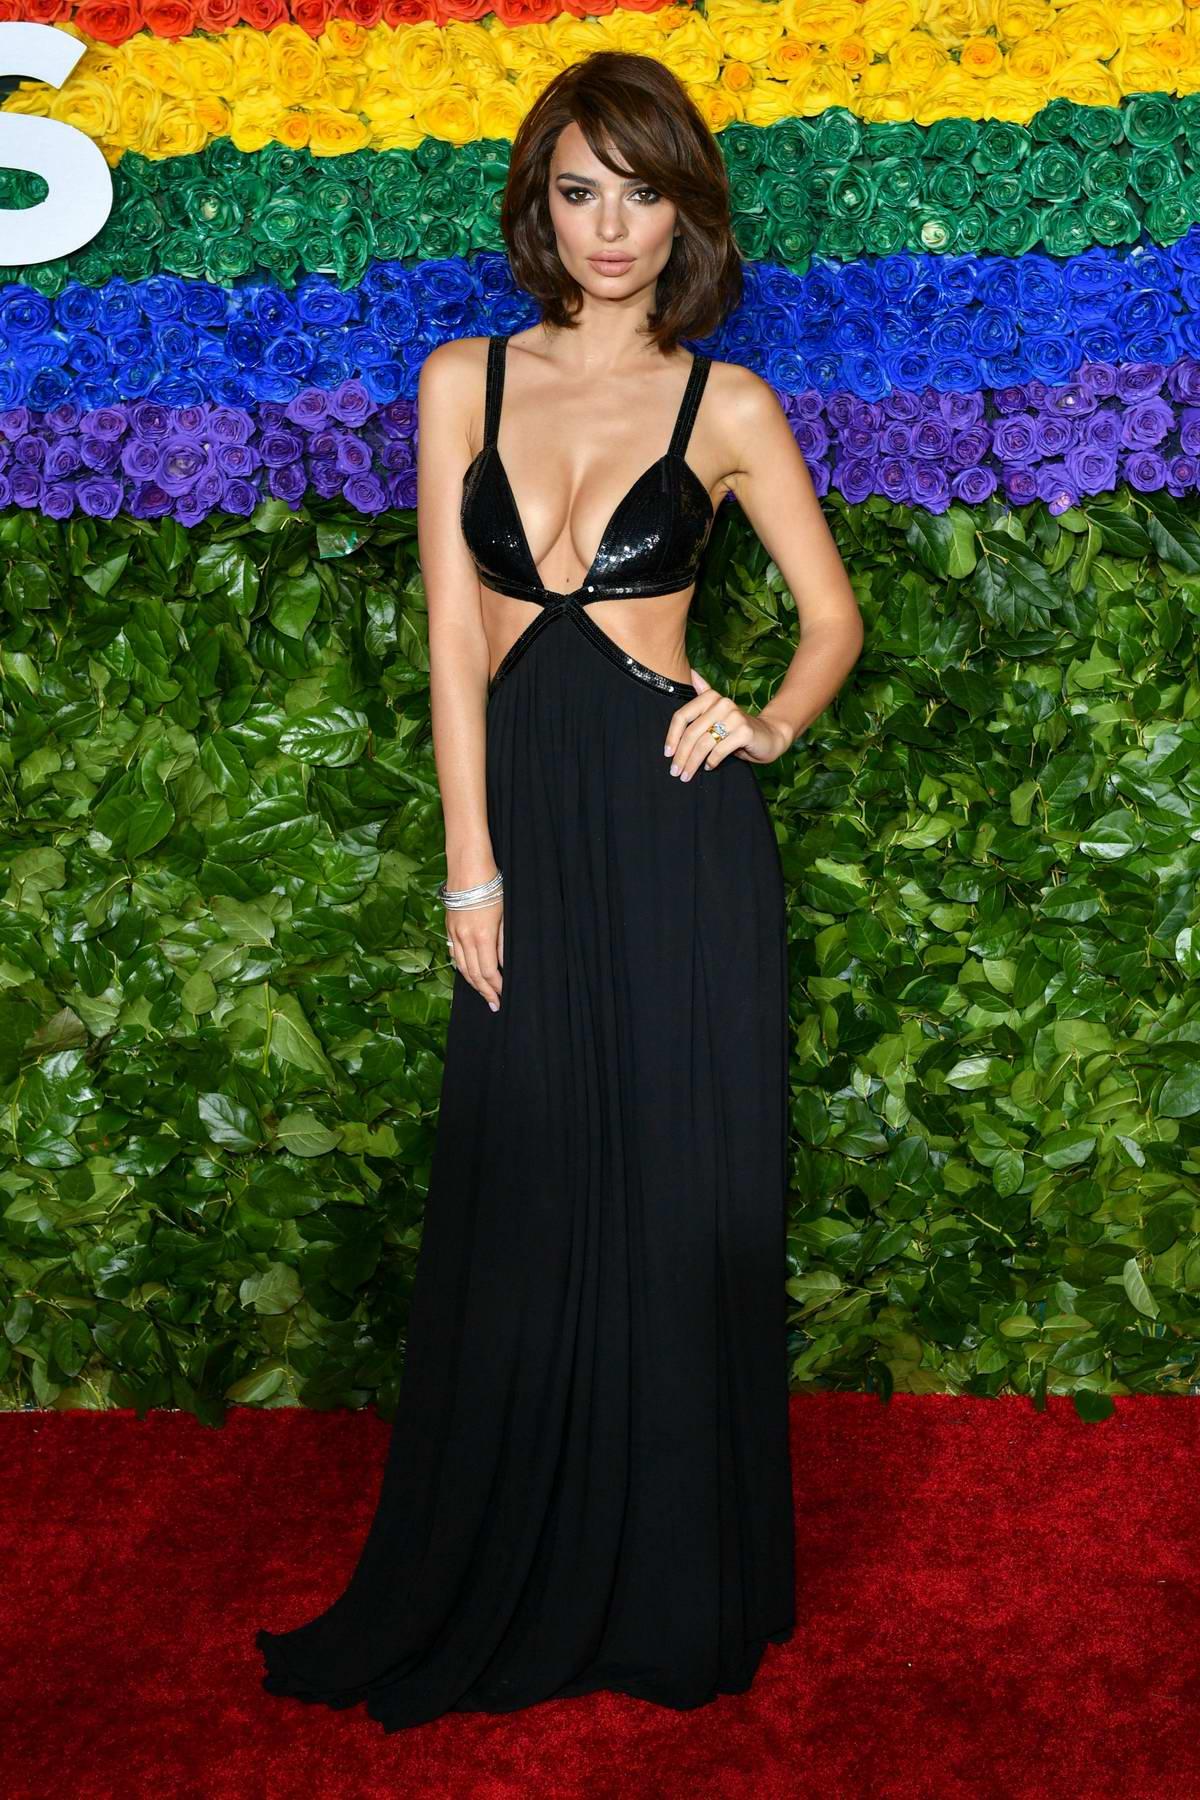 Emily Ratajkowski attends the 73rd annual Tony Awards at Radio City Music Hall in New York City